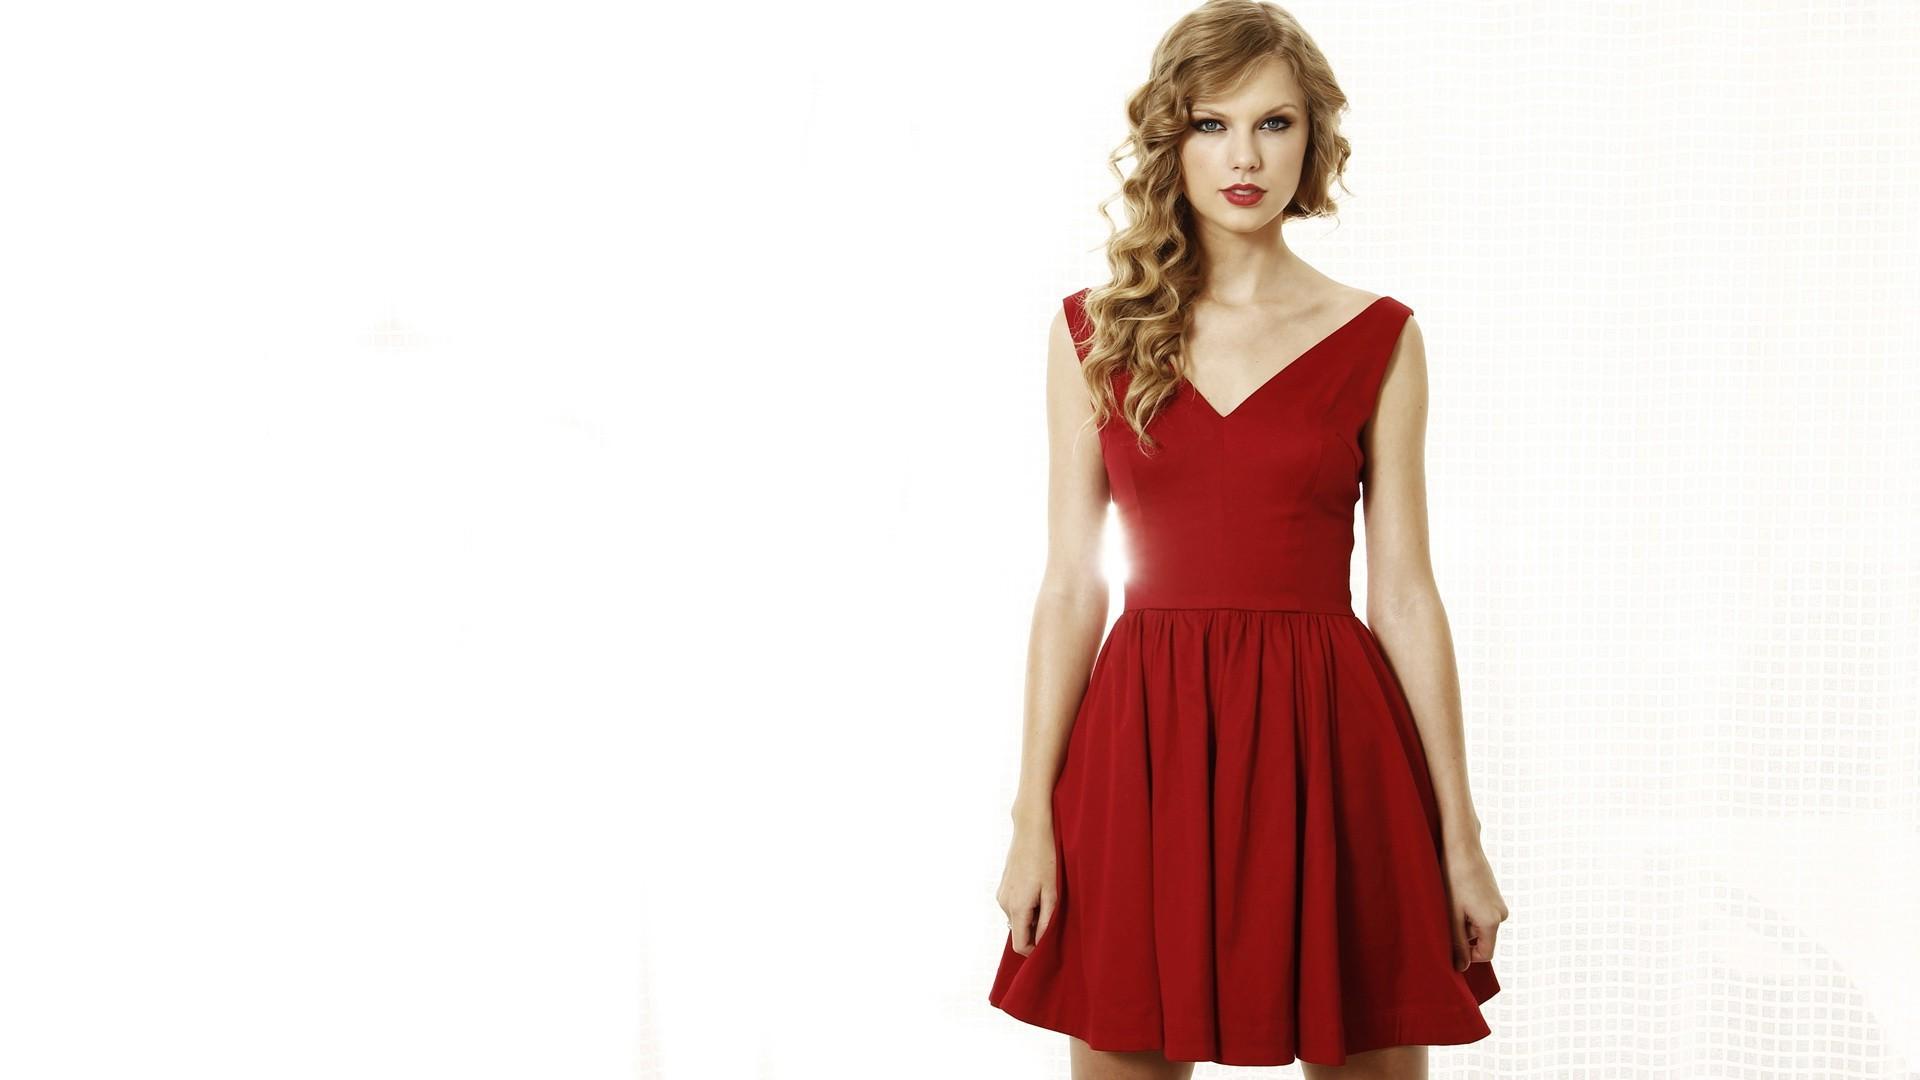 Hintergrundbilder : blond, rot, Berühmtheit, Sänger, Kleid, Muster ...